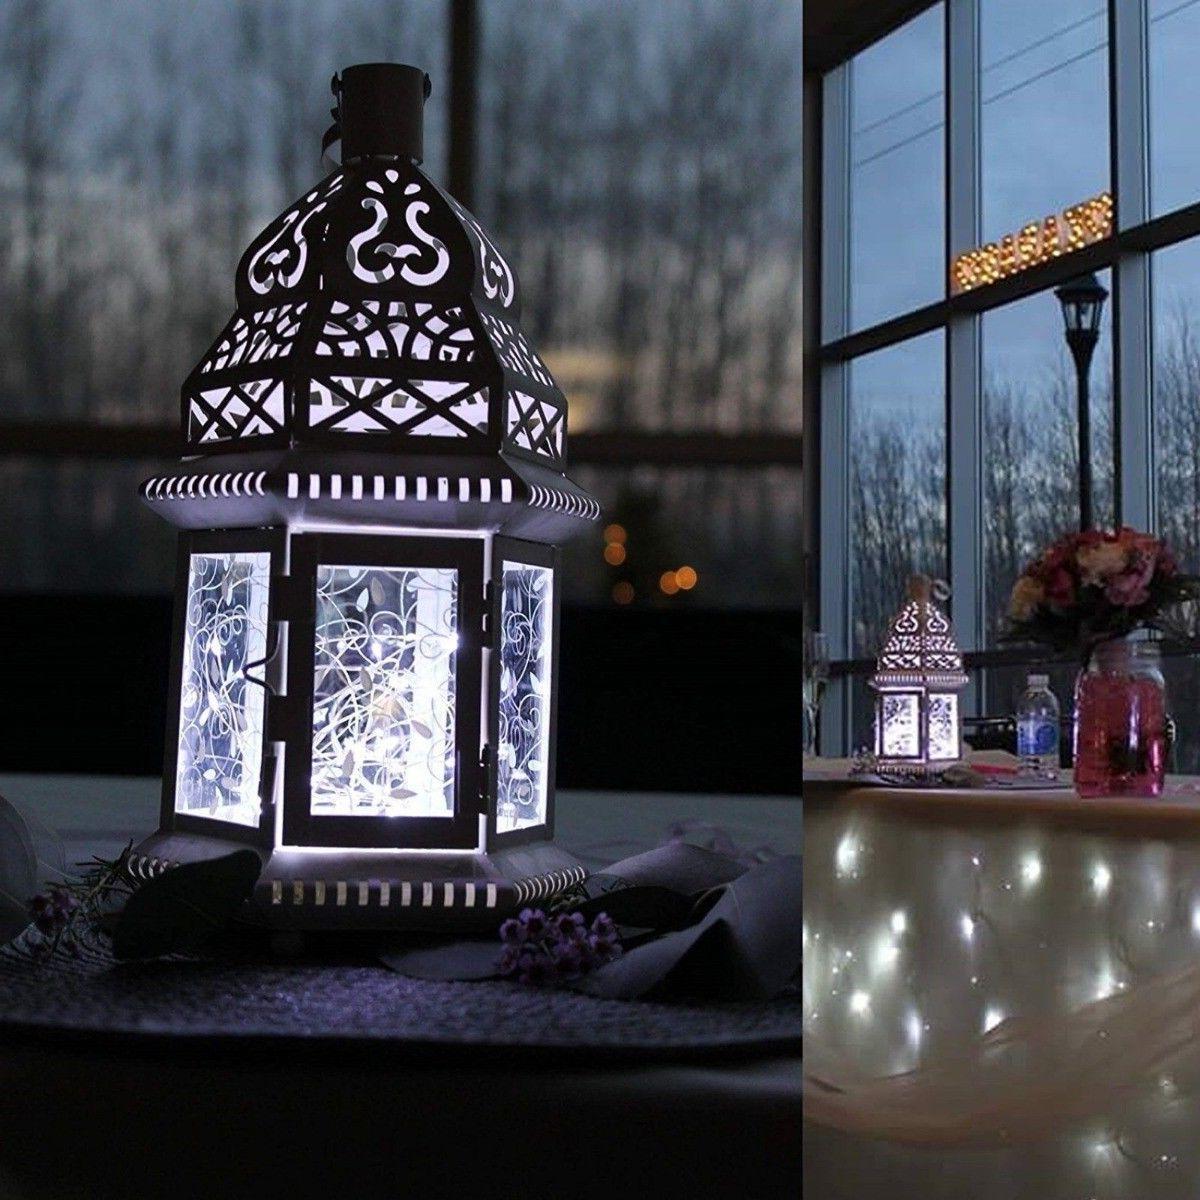 6x 20 2m Waterproof LED Silver Copper String Lights Decor